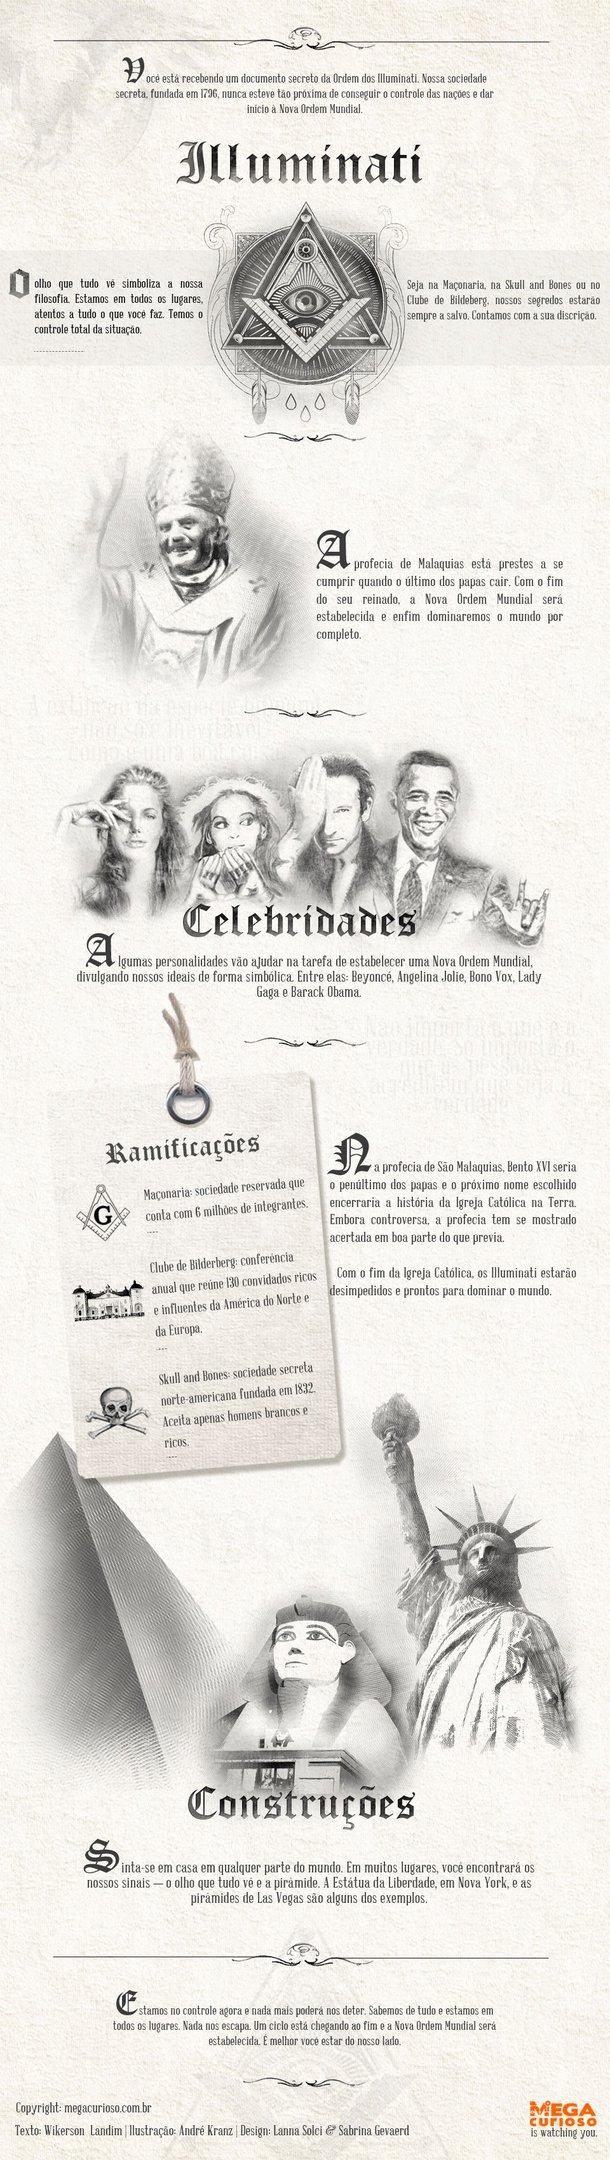 Tudo sobre os Illuminati [infográfico]